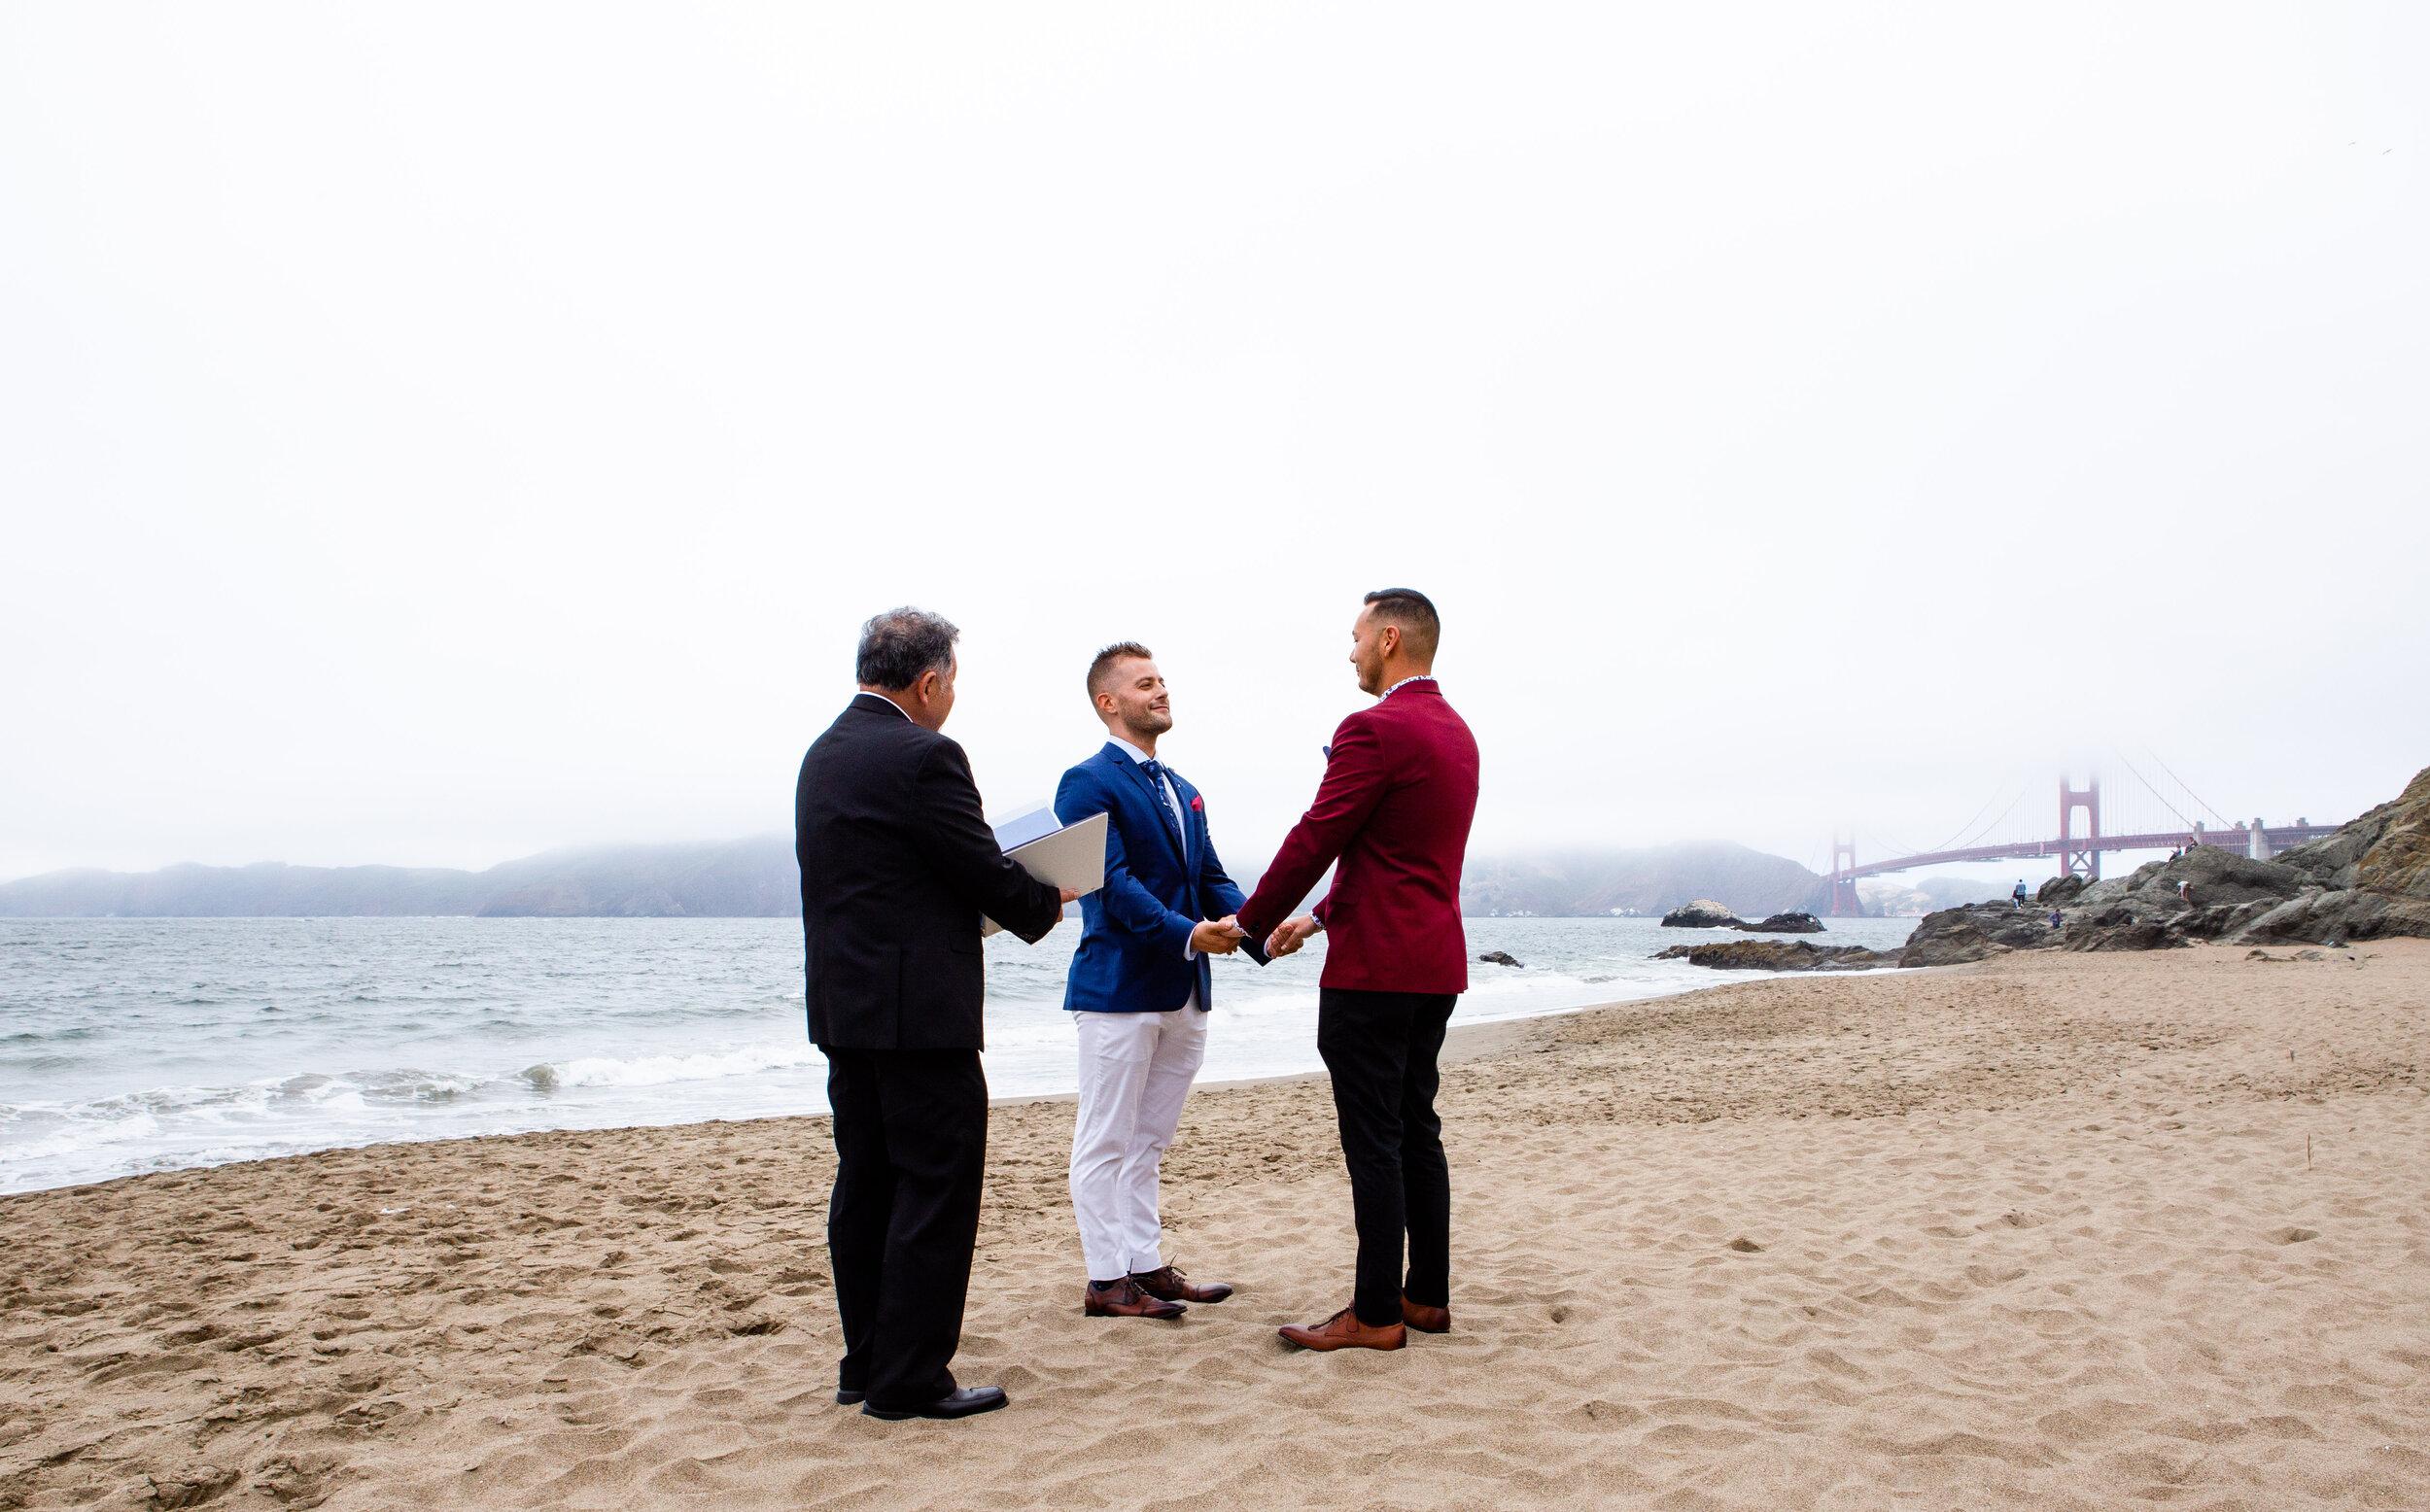 20190726-California-Bakers Beach San Francisco-Mauricio and Parick--1.jpg